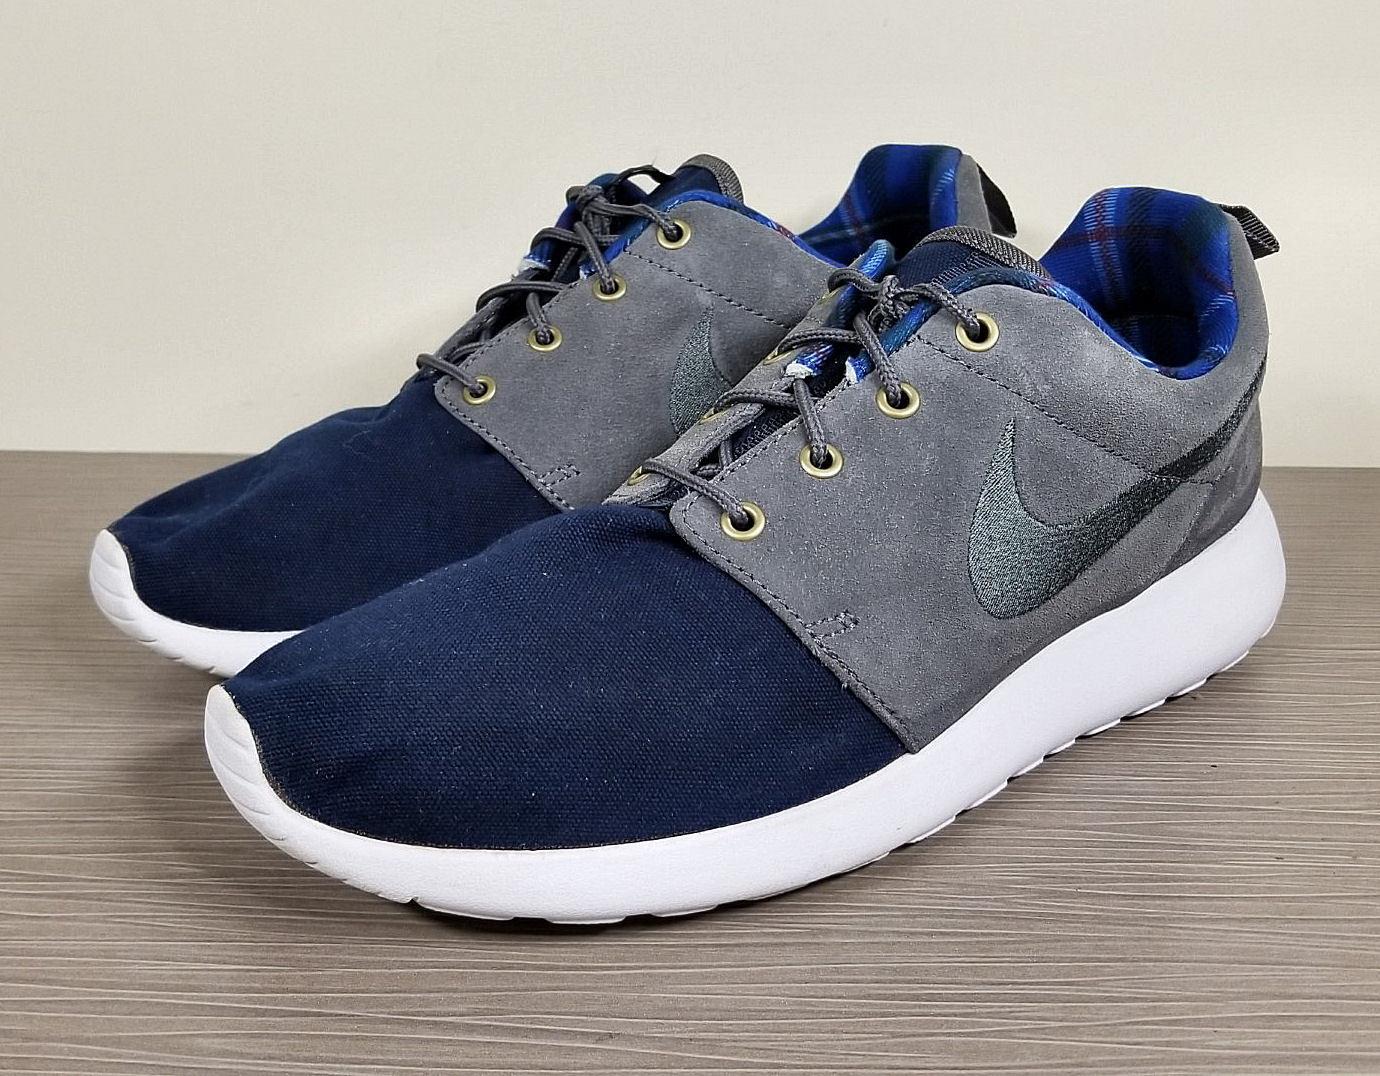 Nike Roshe One Premium, Grey Dark Obsidian / Dark Grey Premium, / White, Mens Size 10 / 44 8ffa52